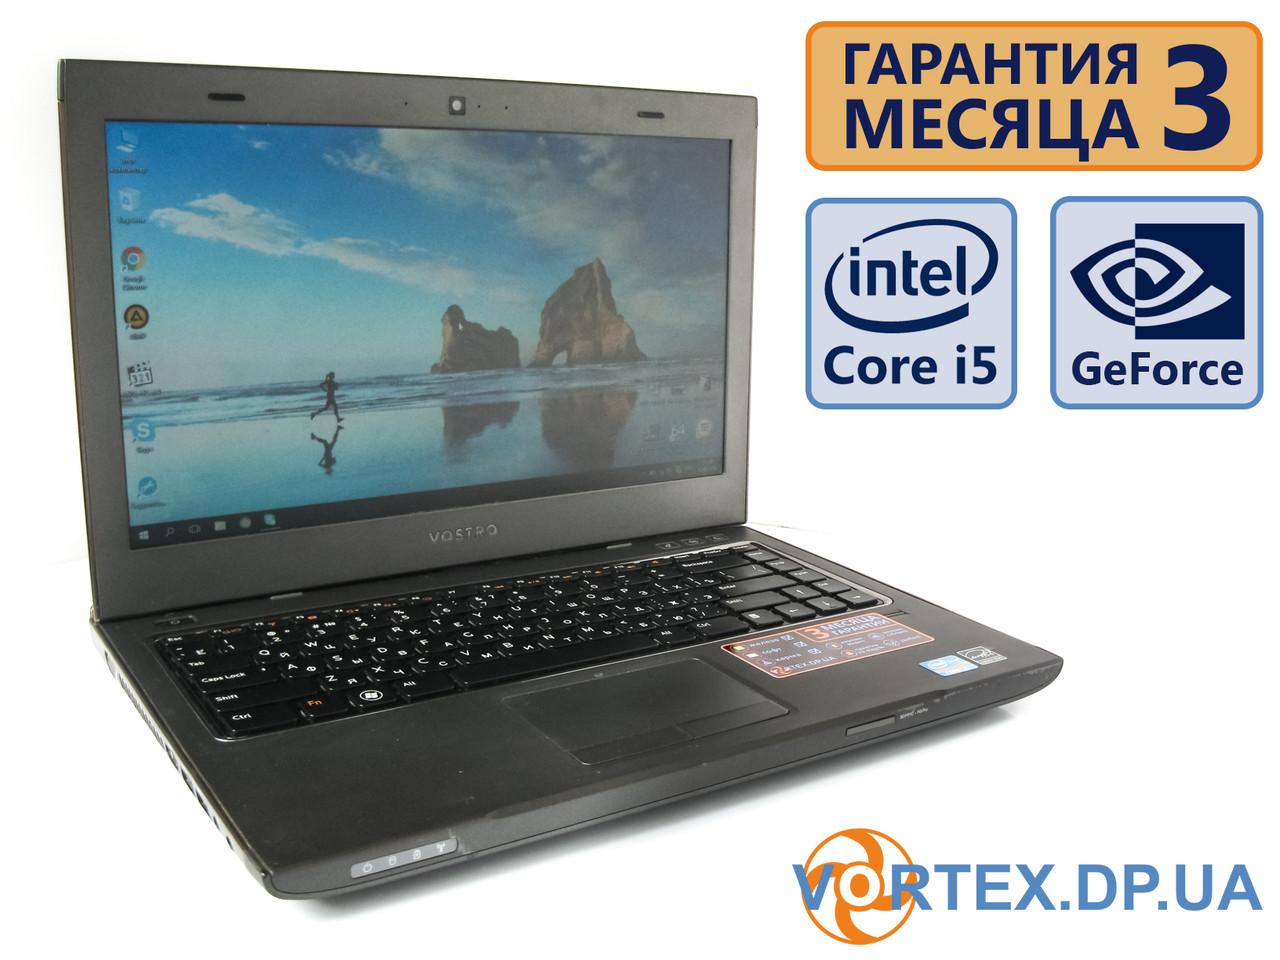 Ноутбук Dell Vostro 3460 (14.0 (1366x768) / Intel Core i5-3210M / nVID